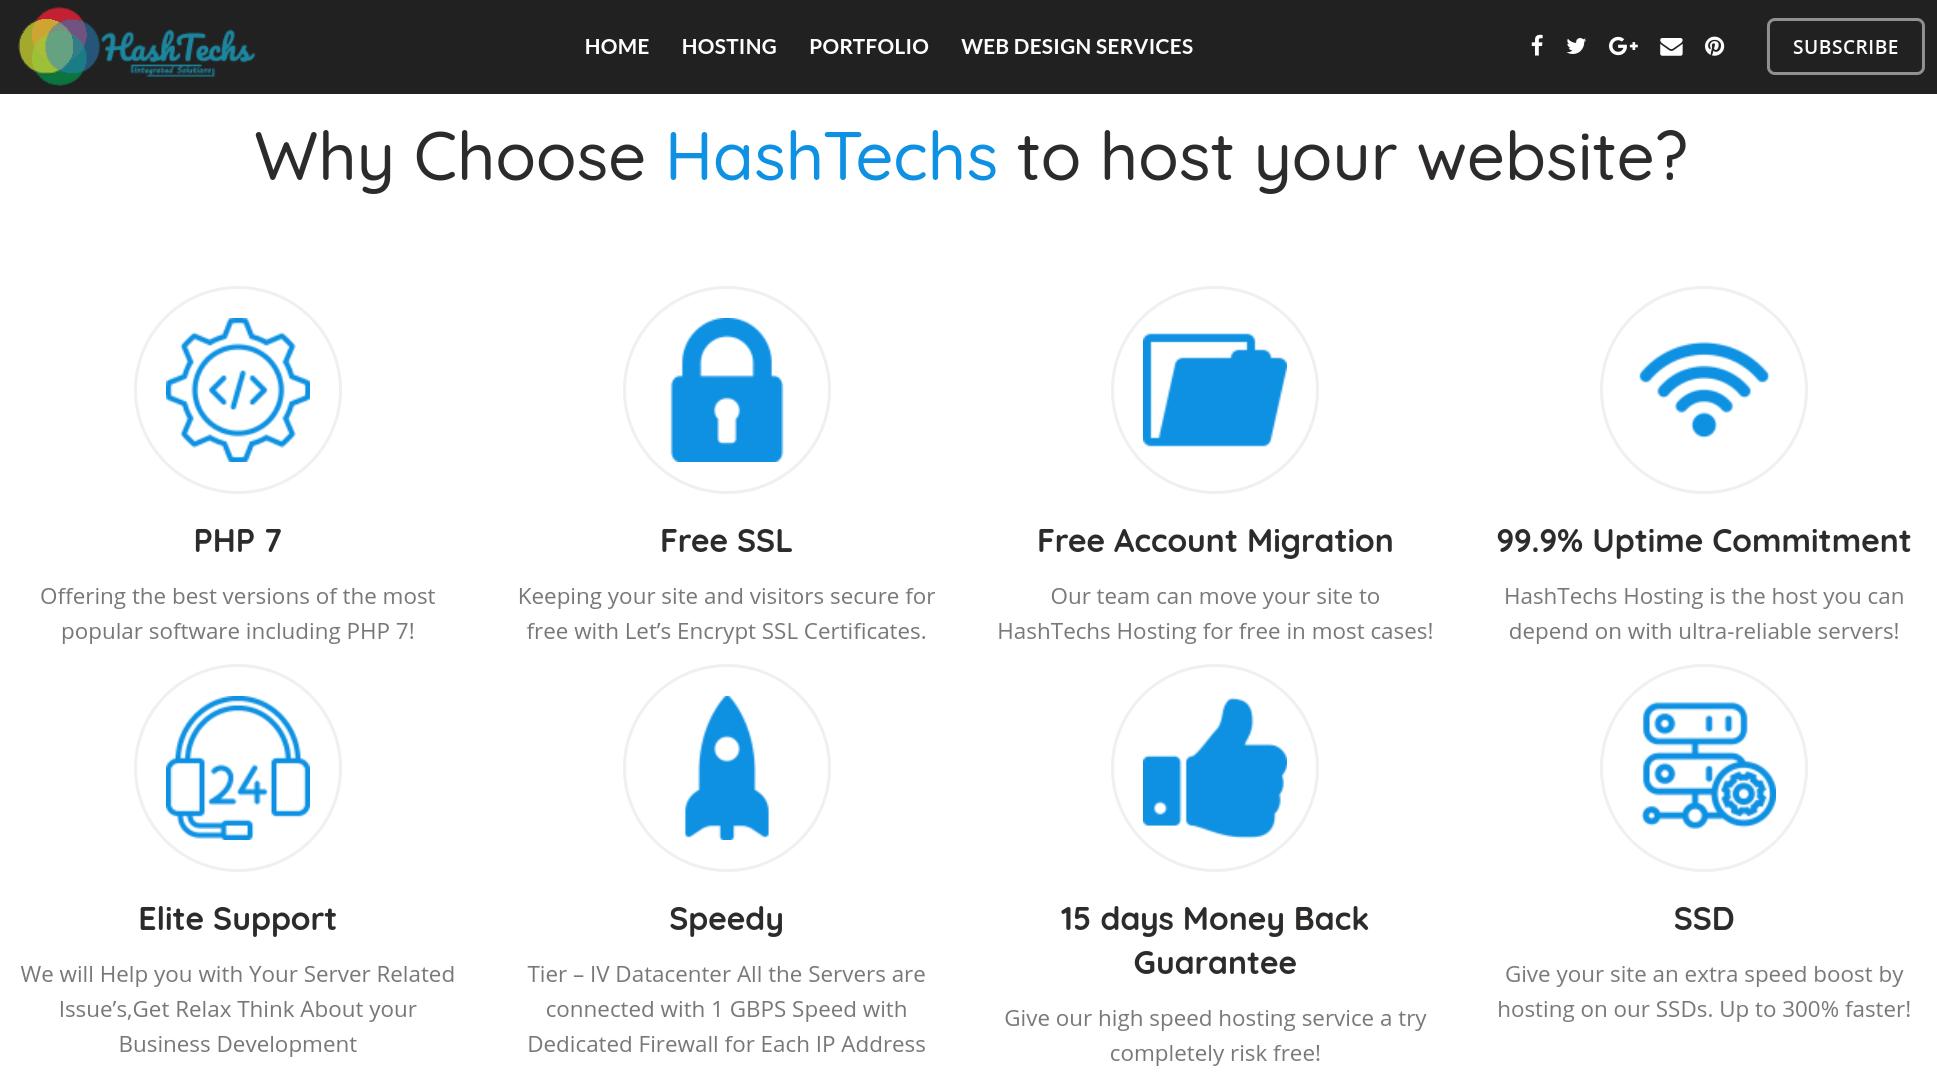 HashTechs